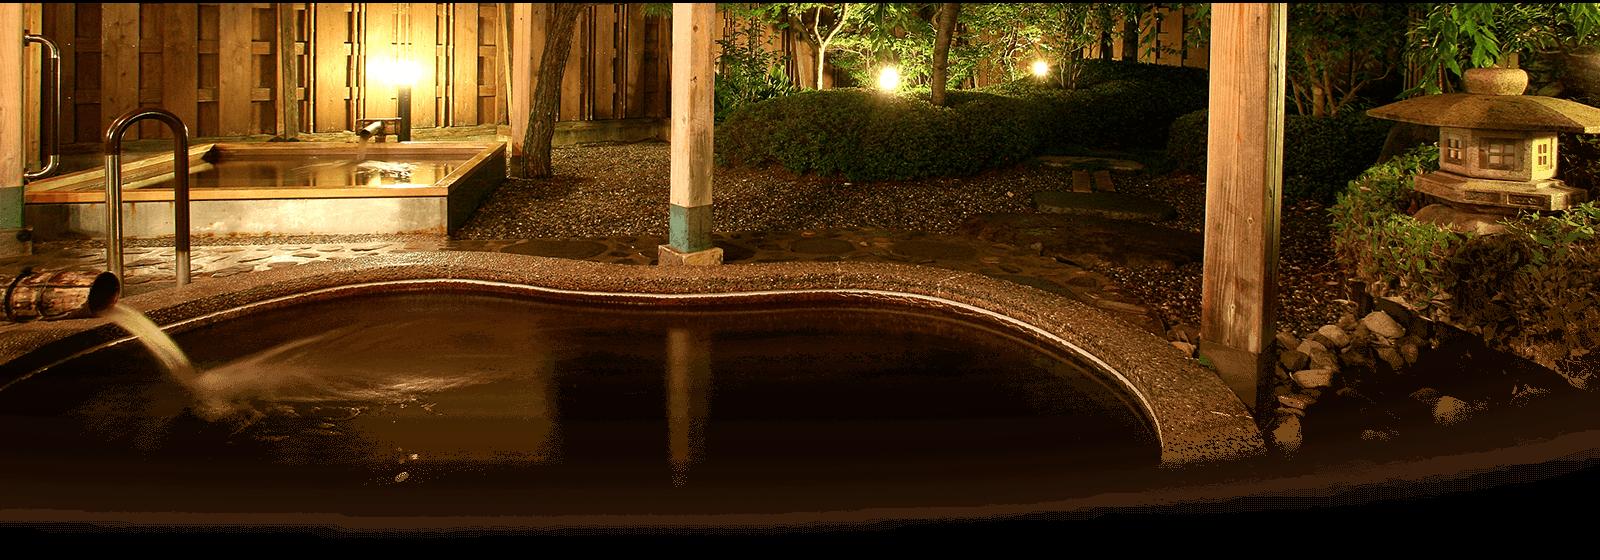 北門屋敷の温泉